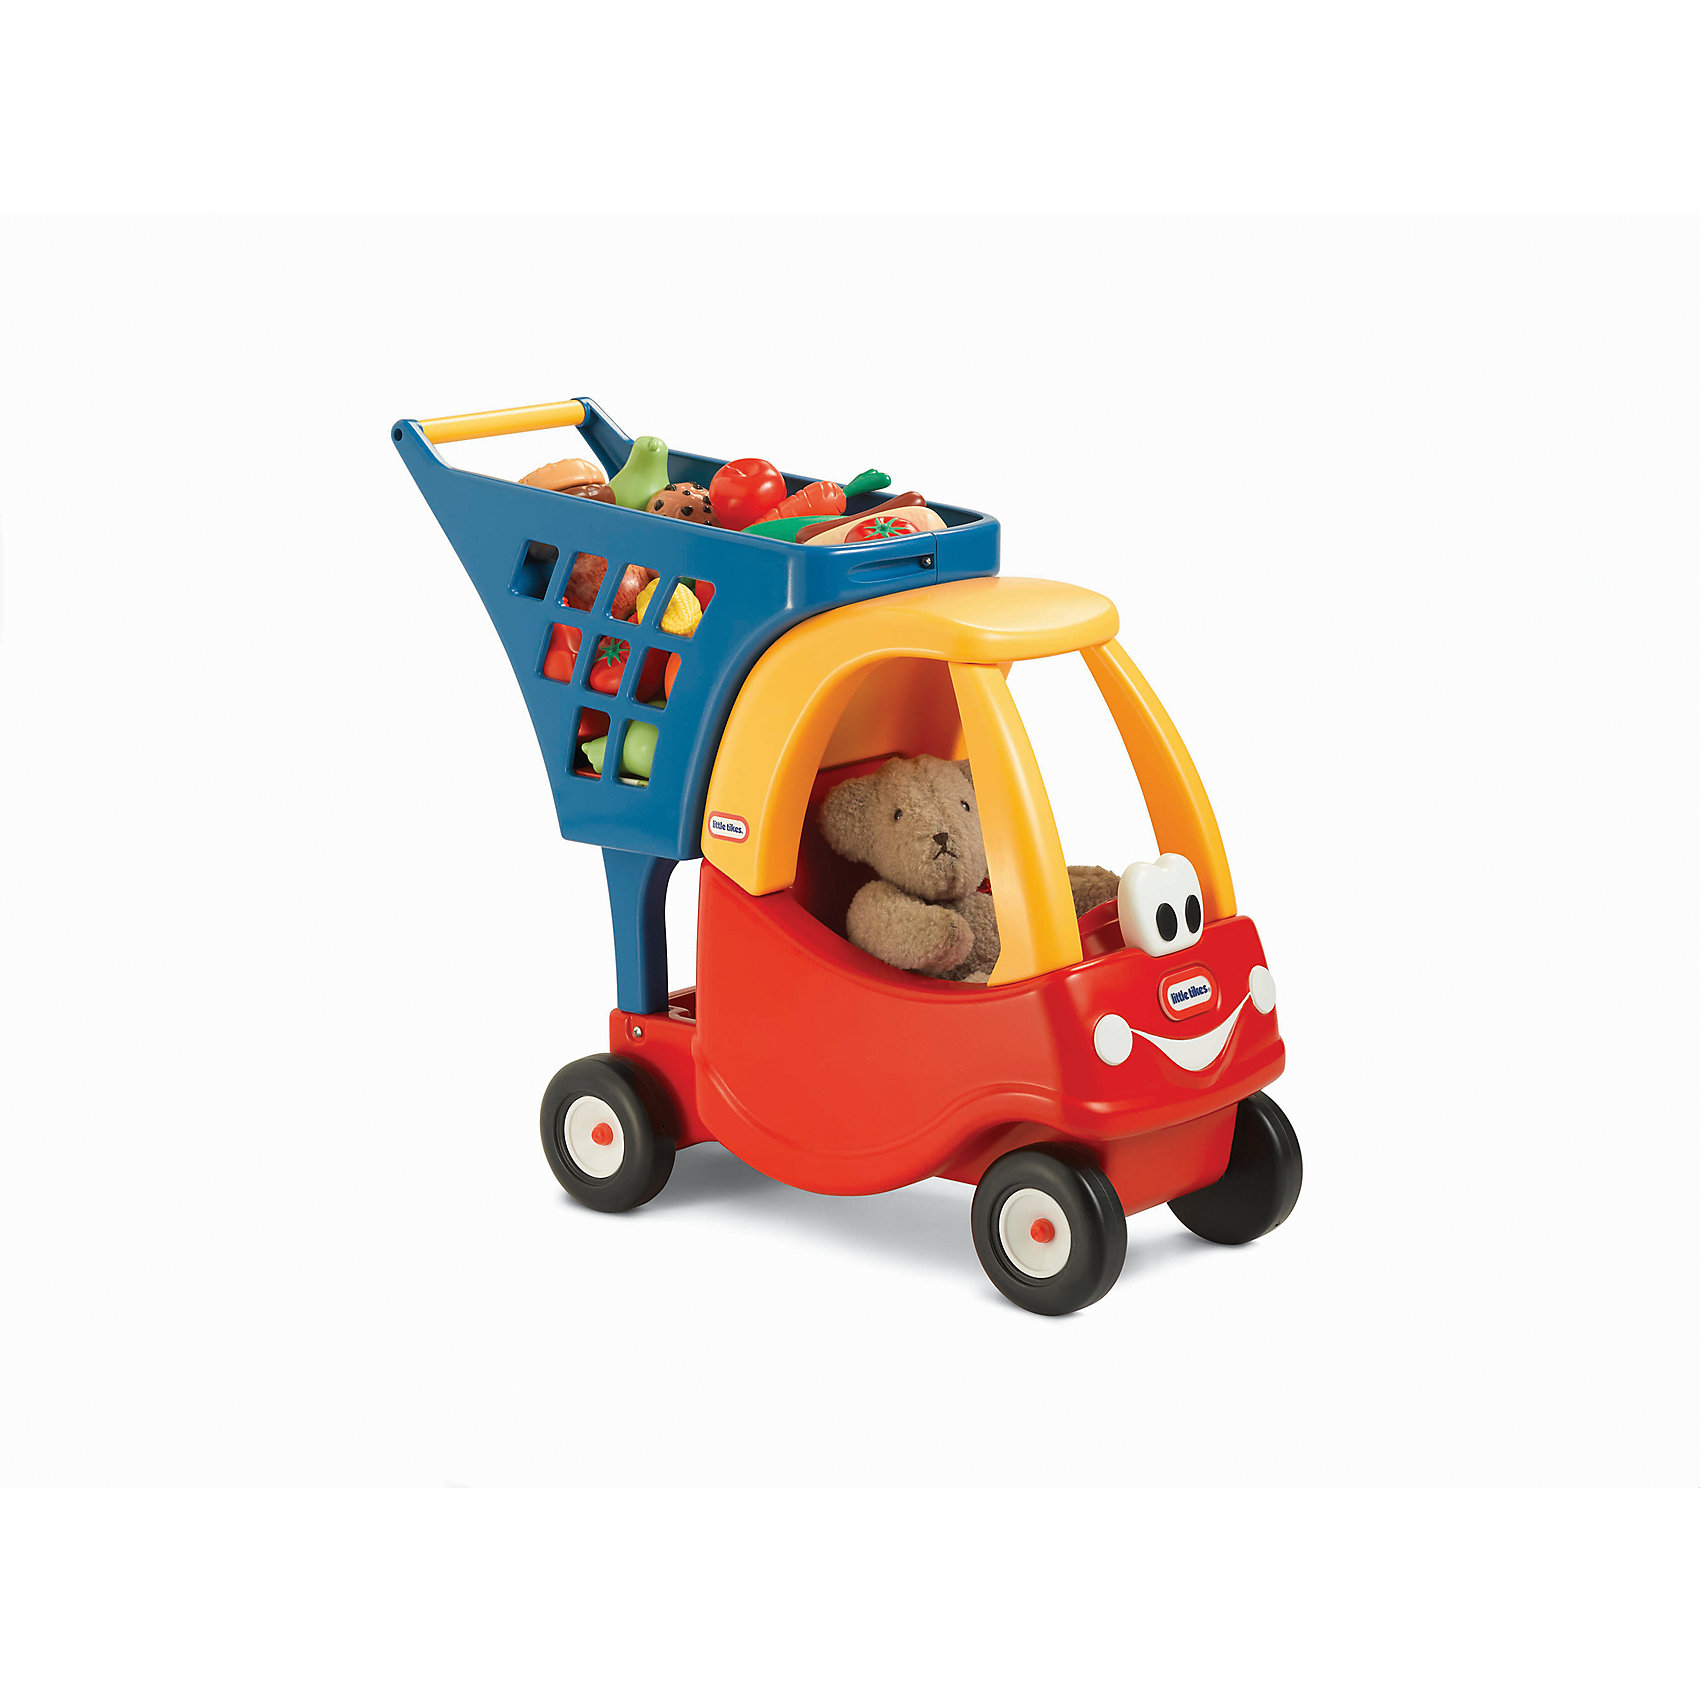 Little Tikes Каталка, красная, Little Tikes органайзер little tikes органайзер карман для детских принадлежностей seat pal серый